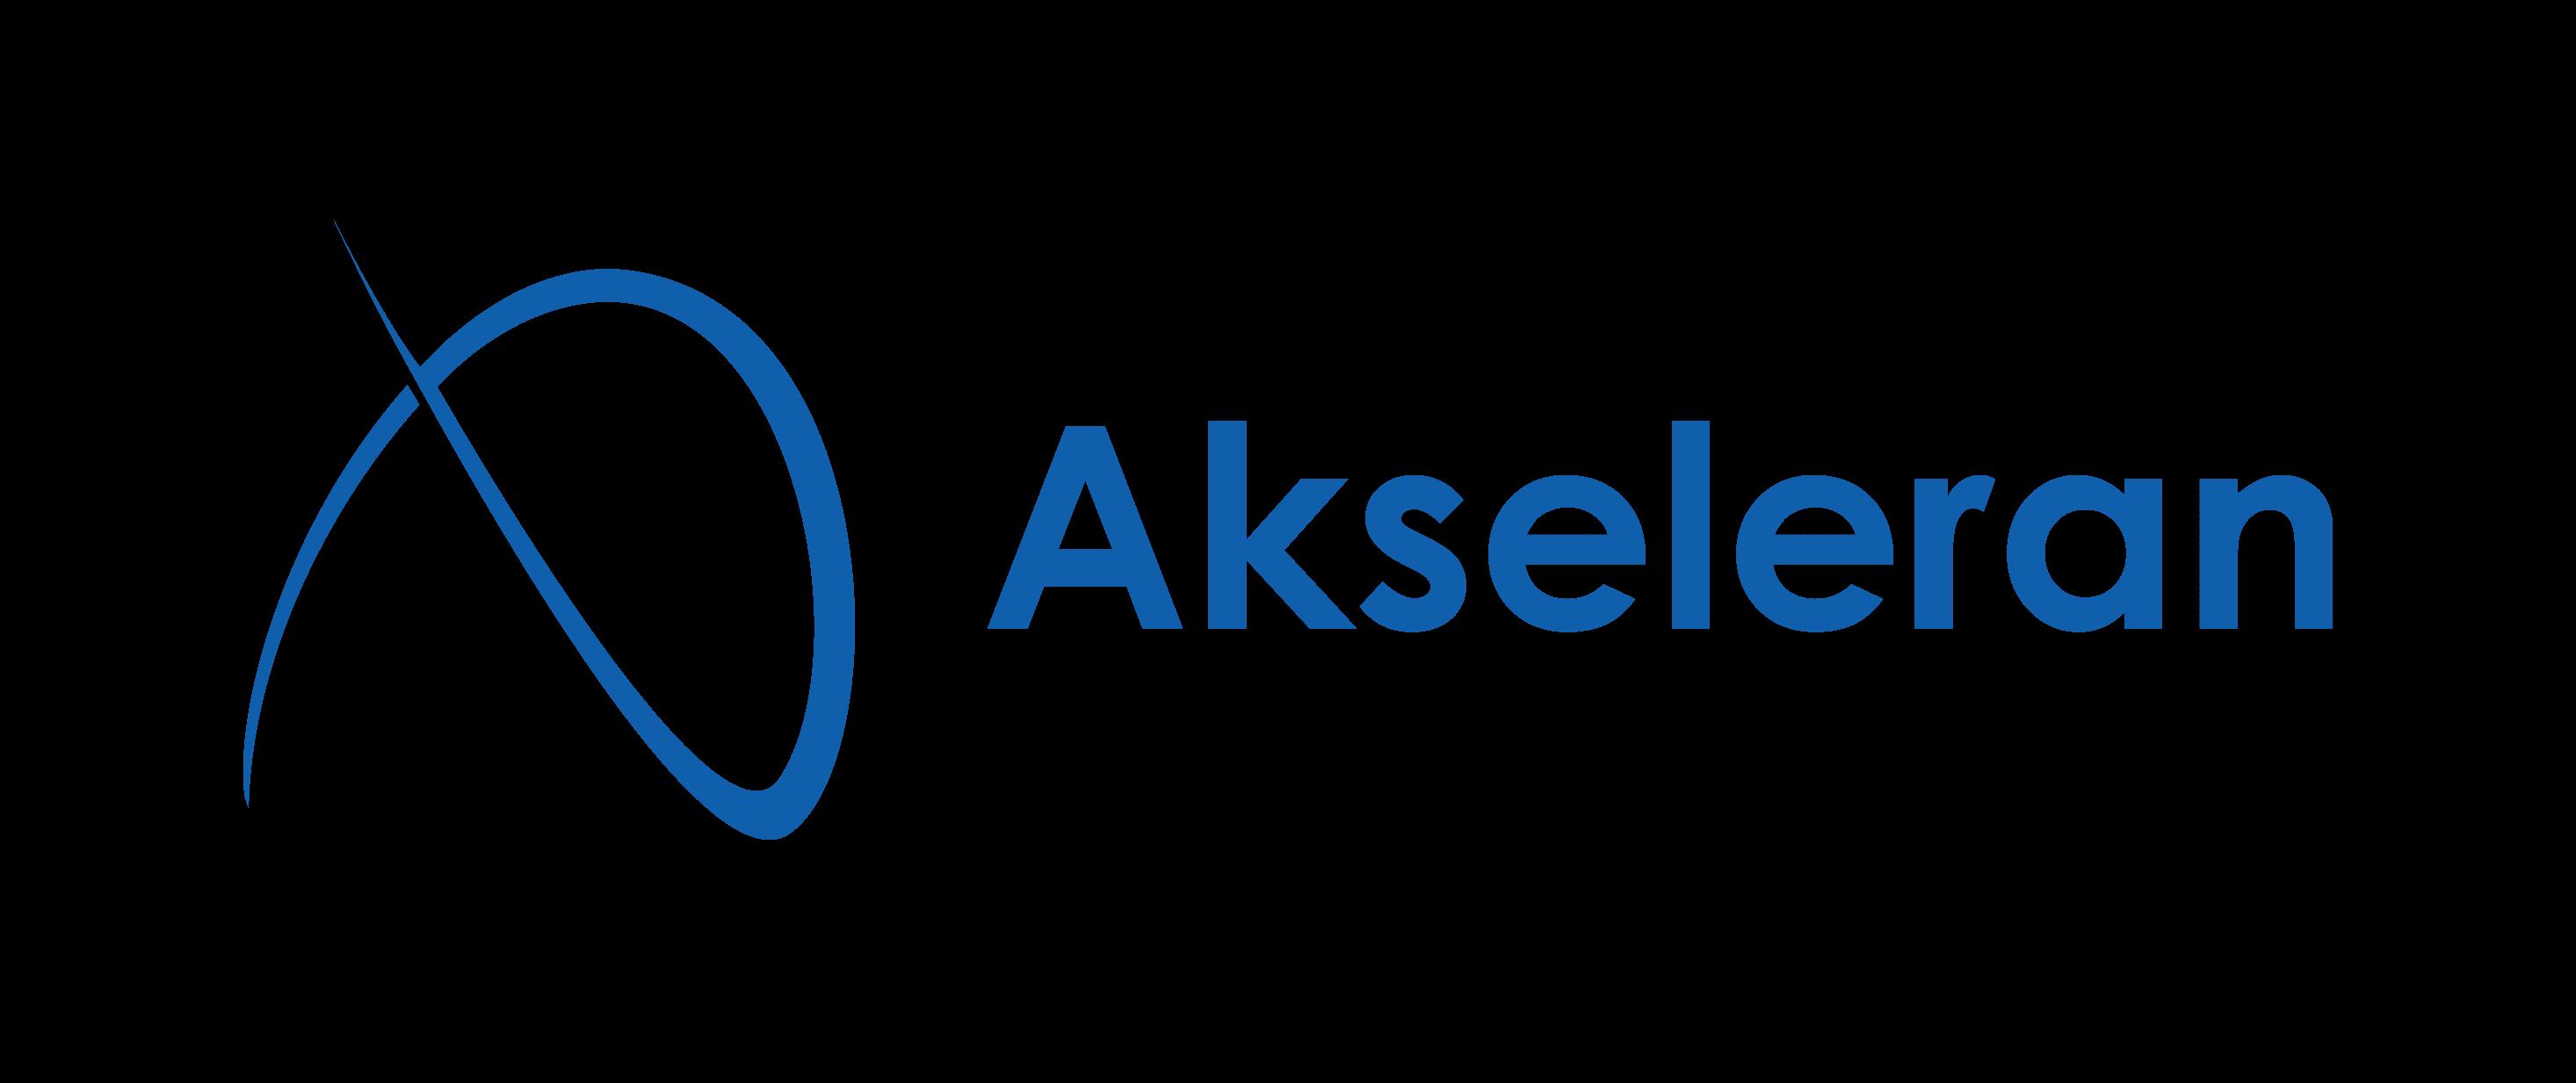 Perbandingan P2P Lending Akseleran, Amartha, Investree, Asetku, dan Cashwagon: Mana yang Terbaik? 1